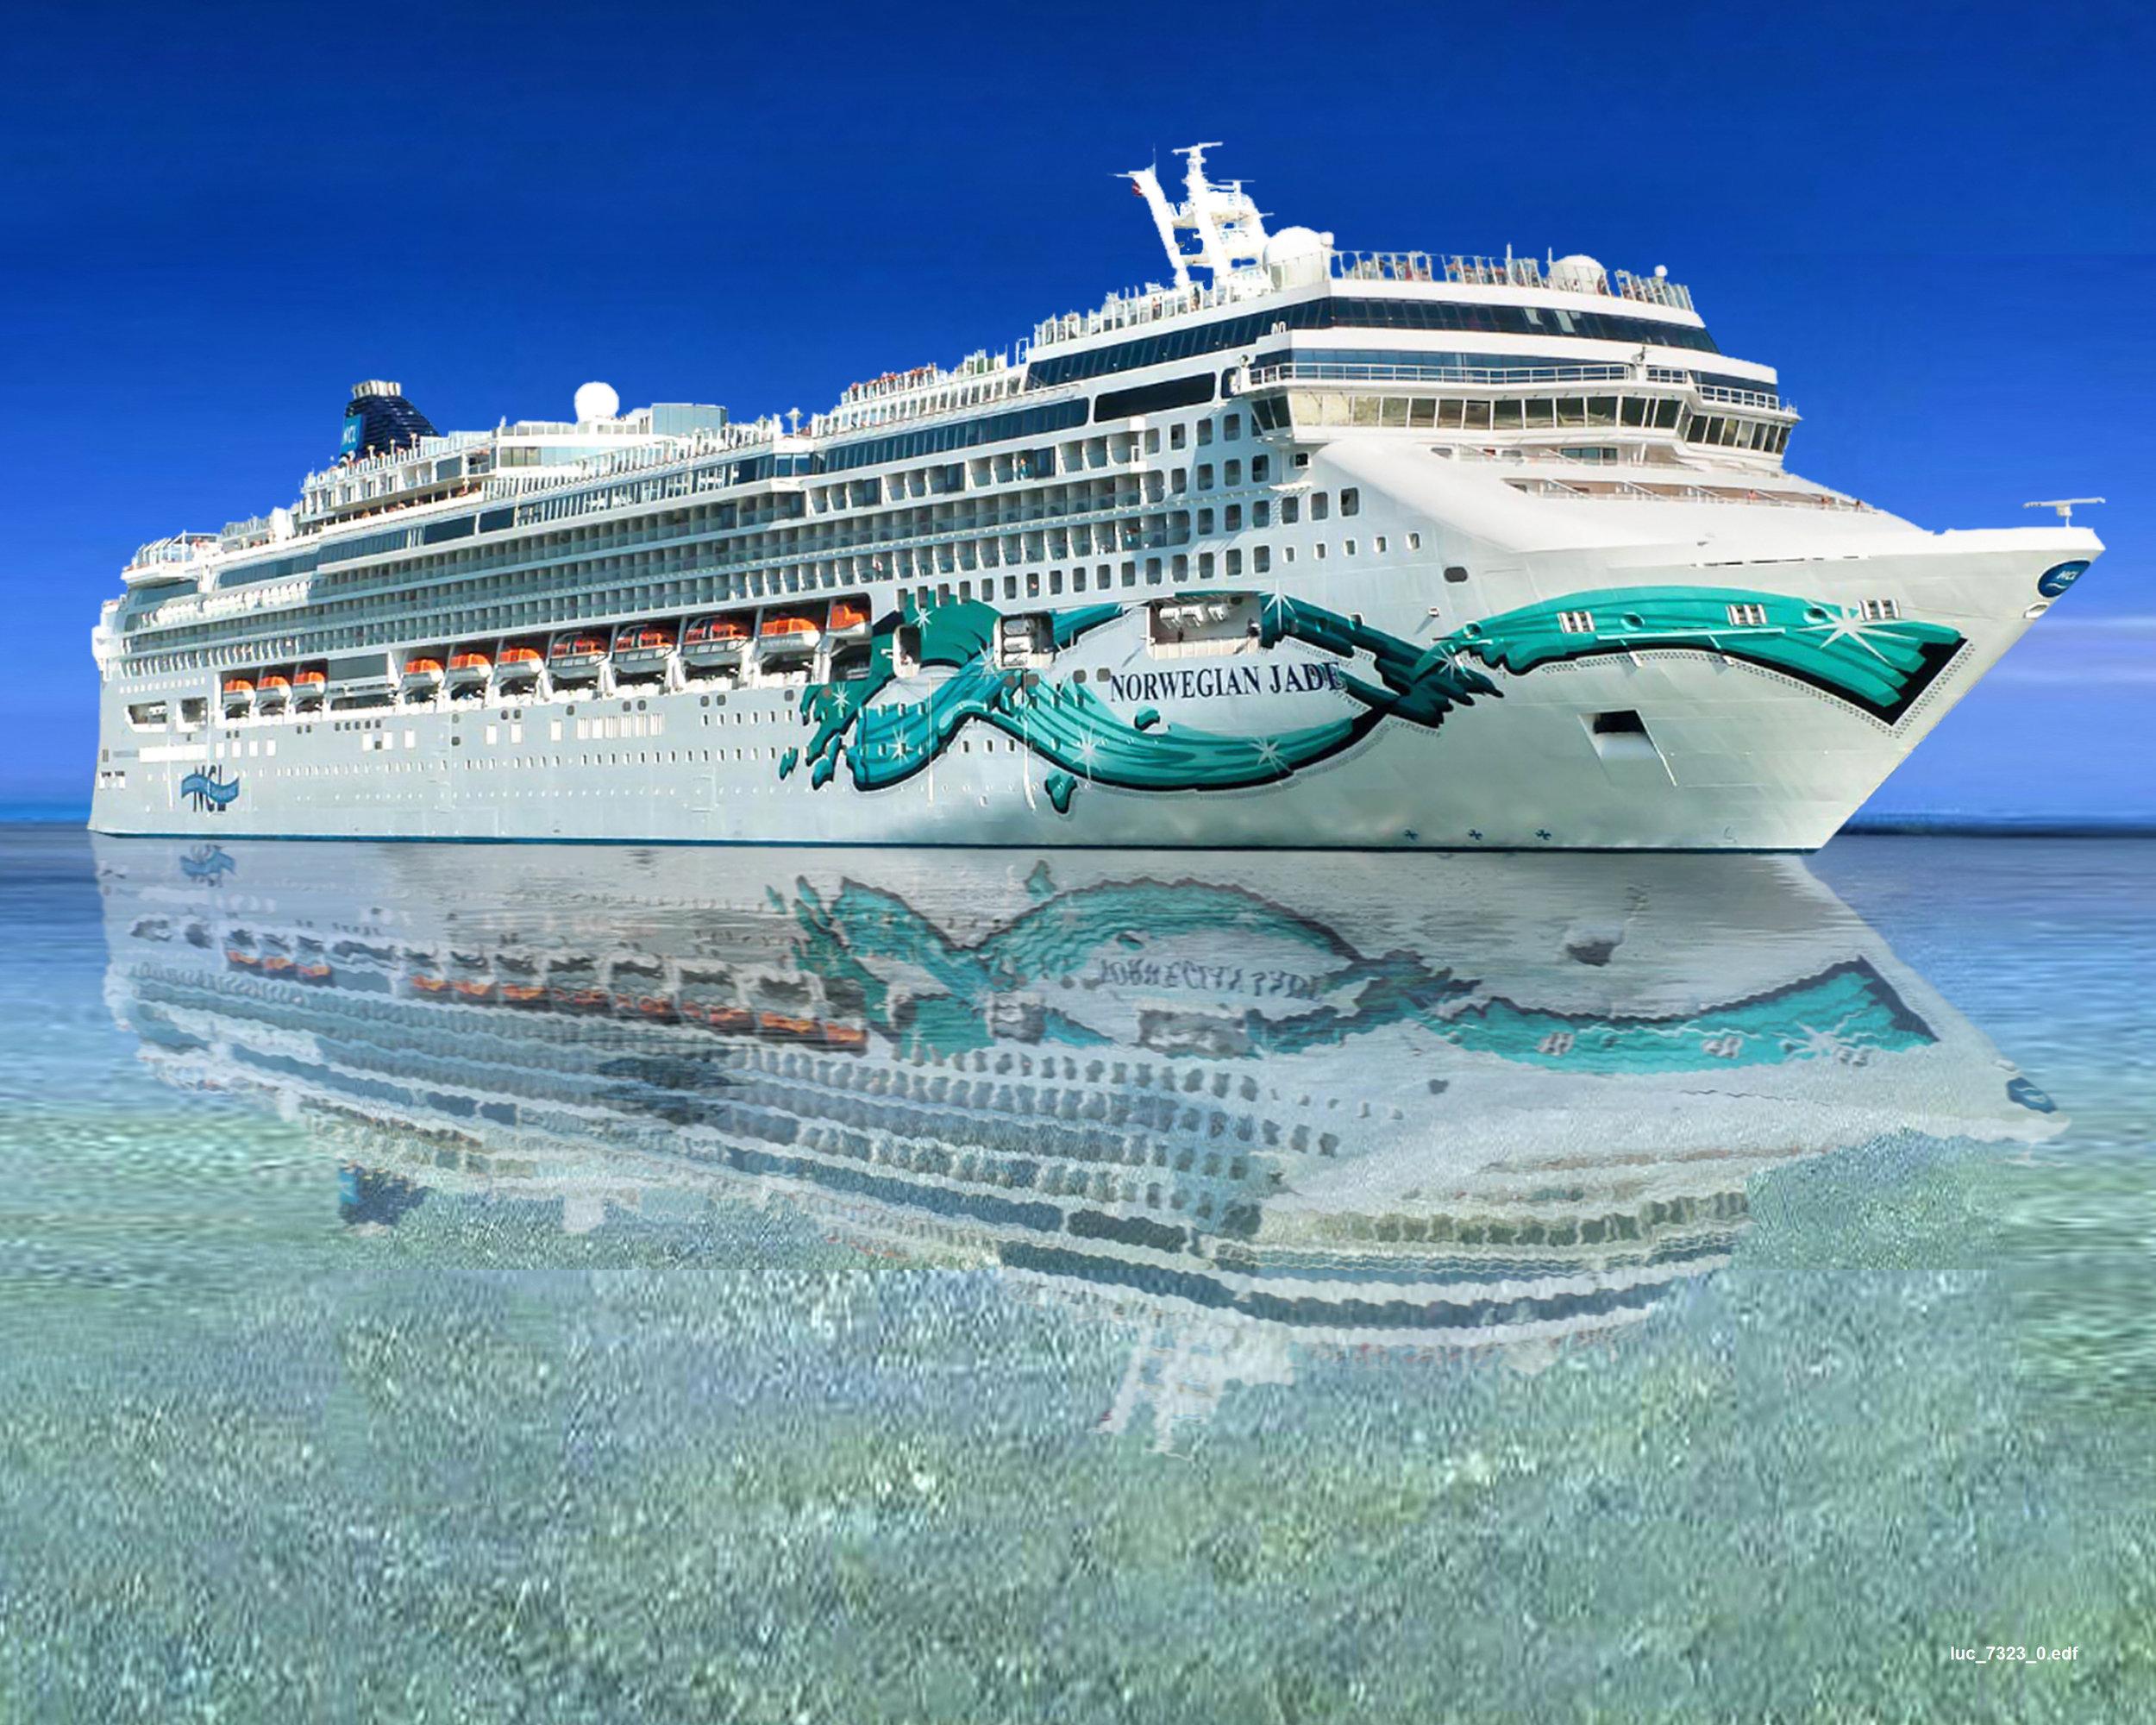 Cruiseship Photography - 3 WEEKS: R17 050 | 2 WEEKS: R11 550